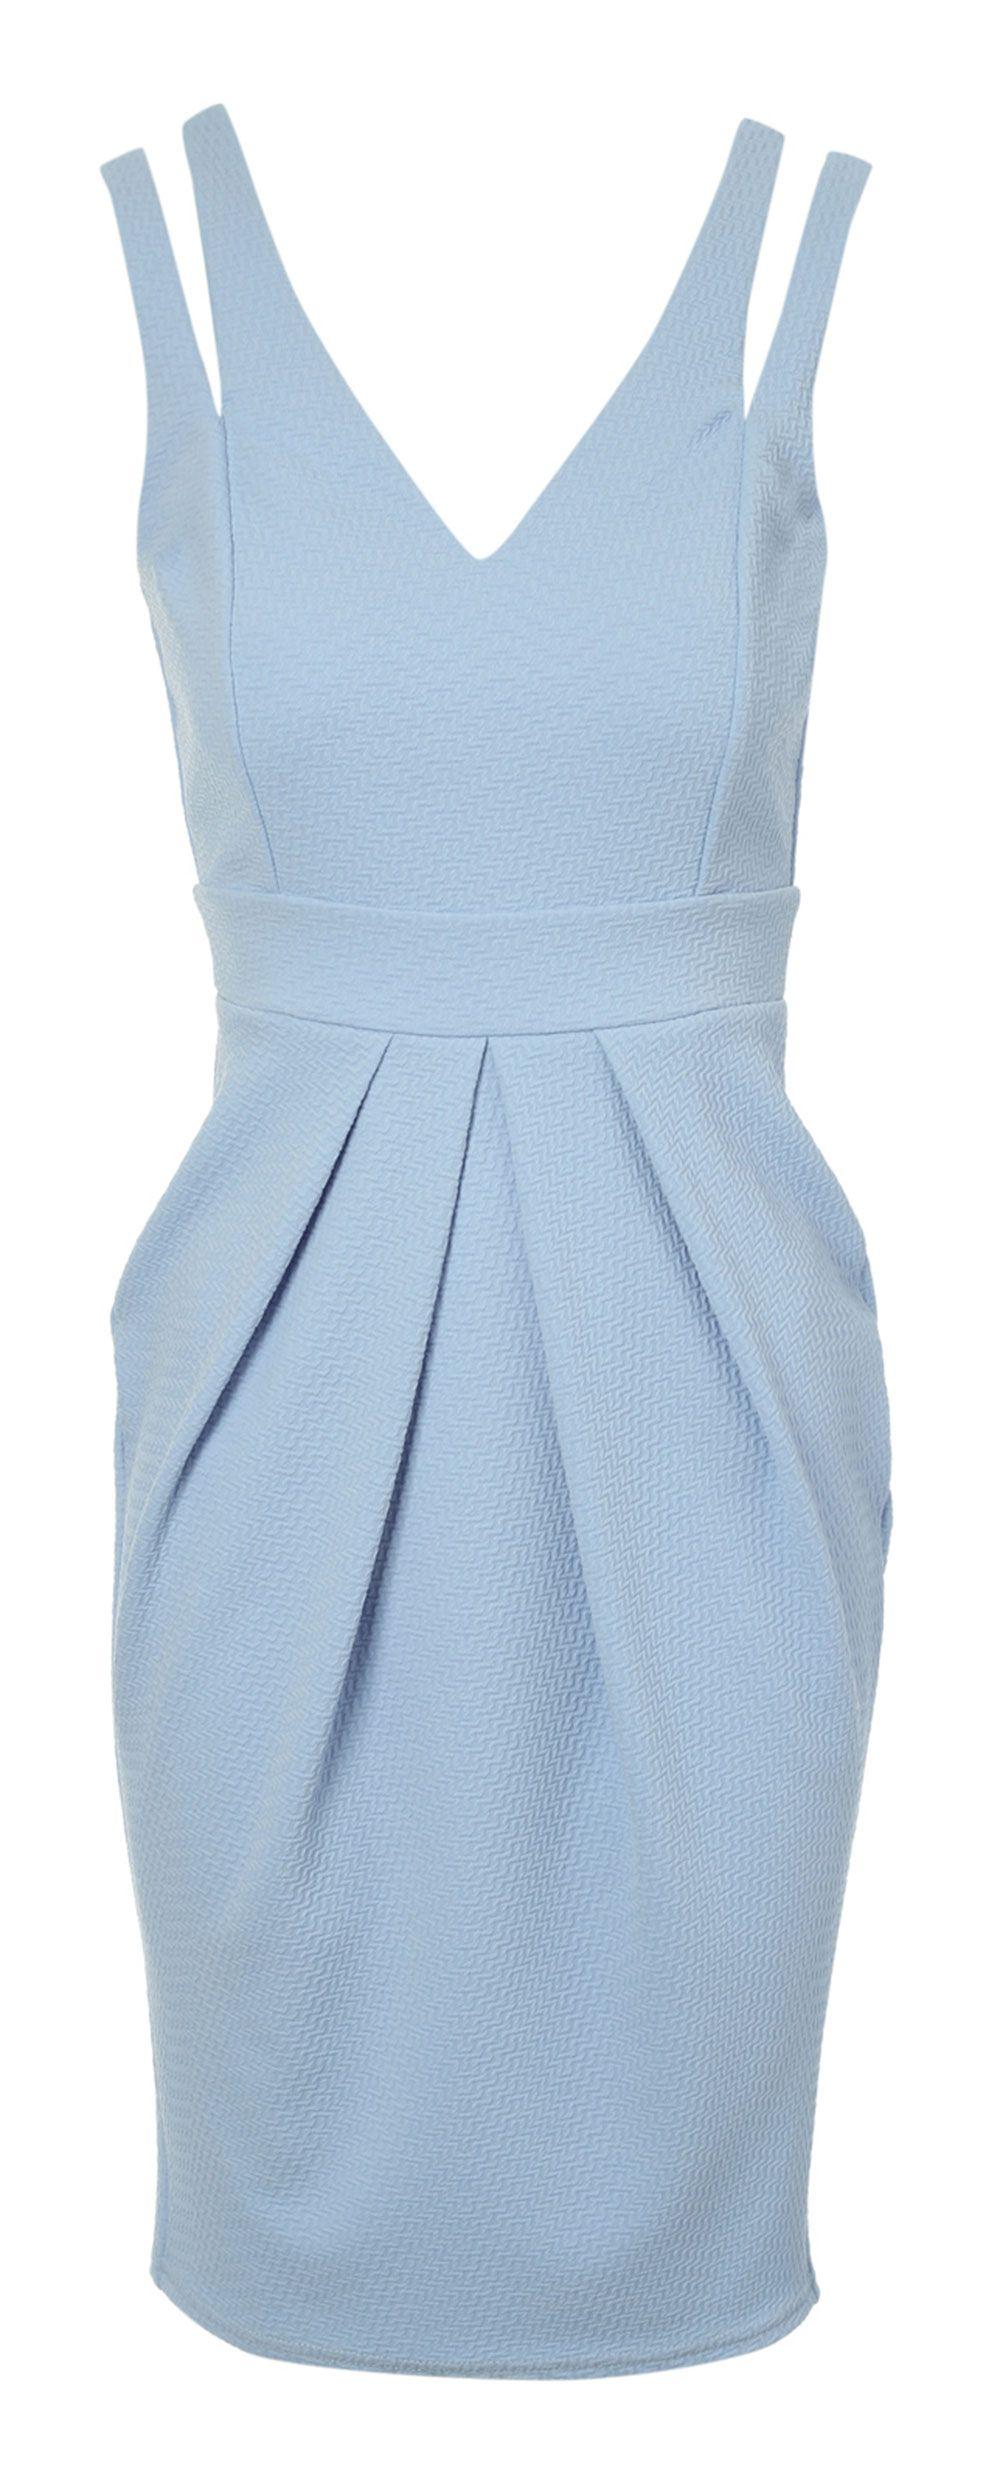 Formal dresses for summer wedding   summer wedding guest dresses under   Wedding Summer and